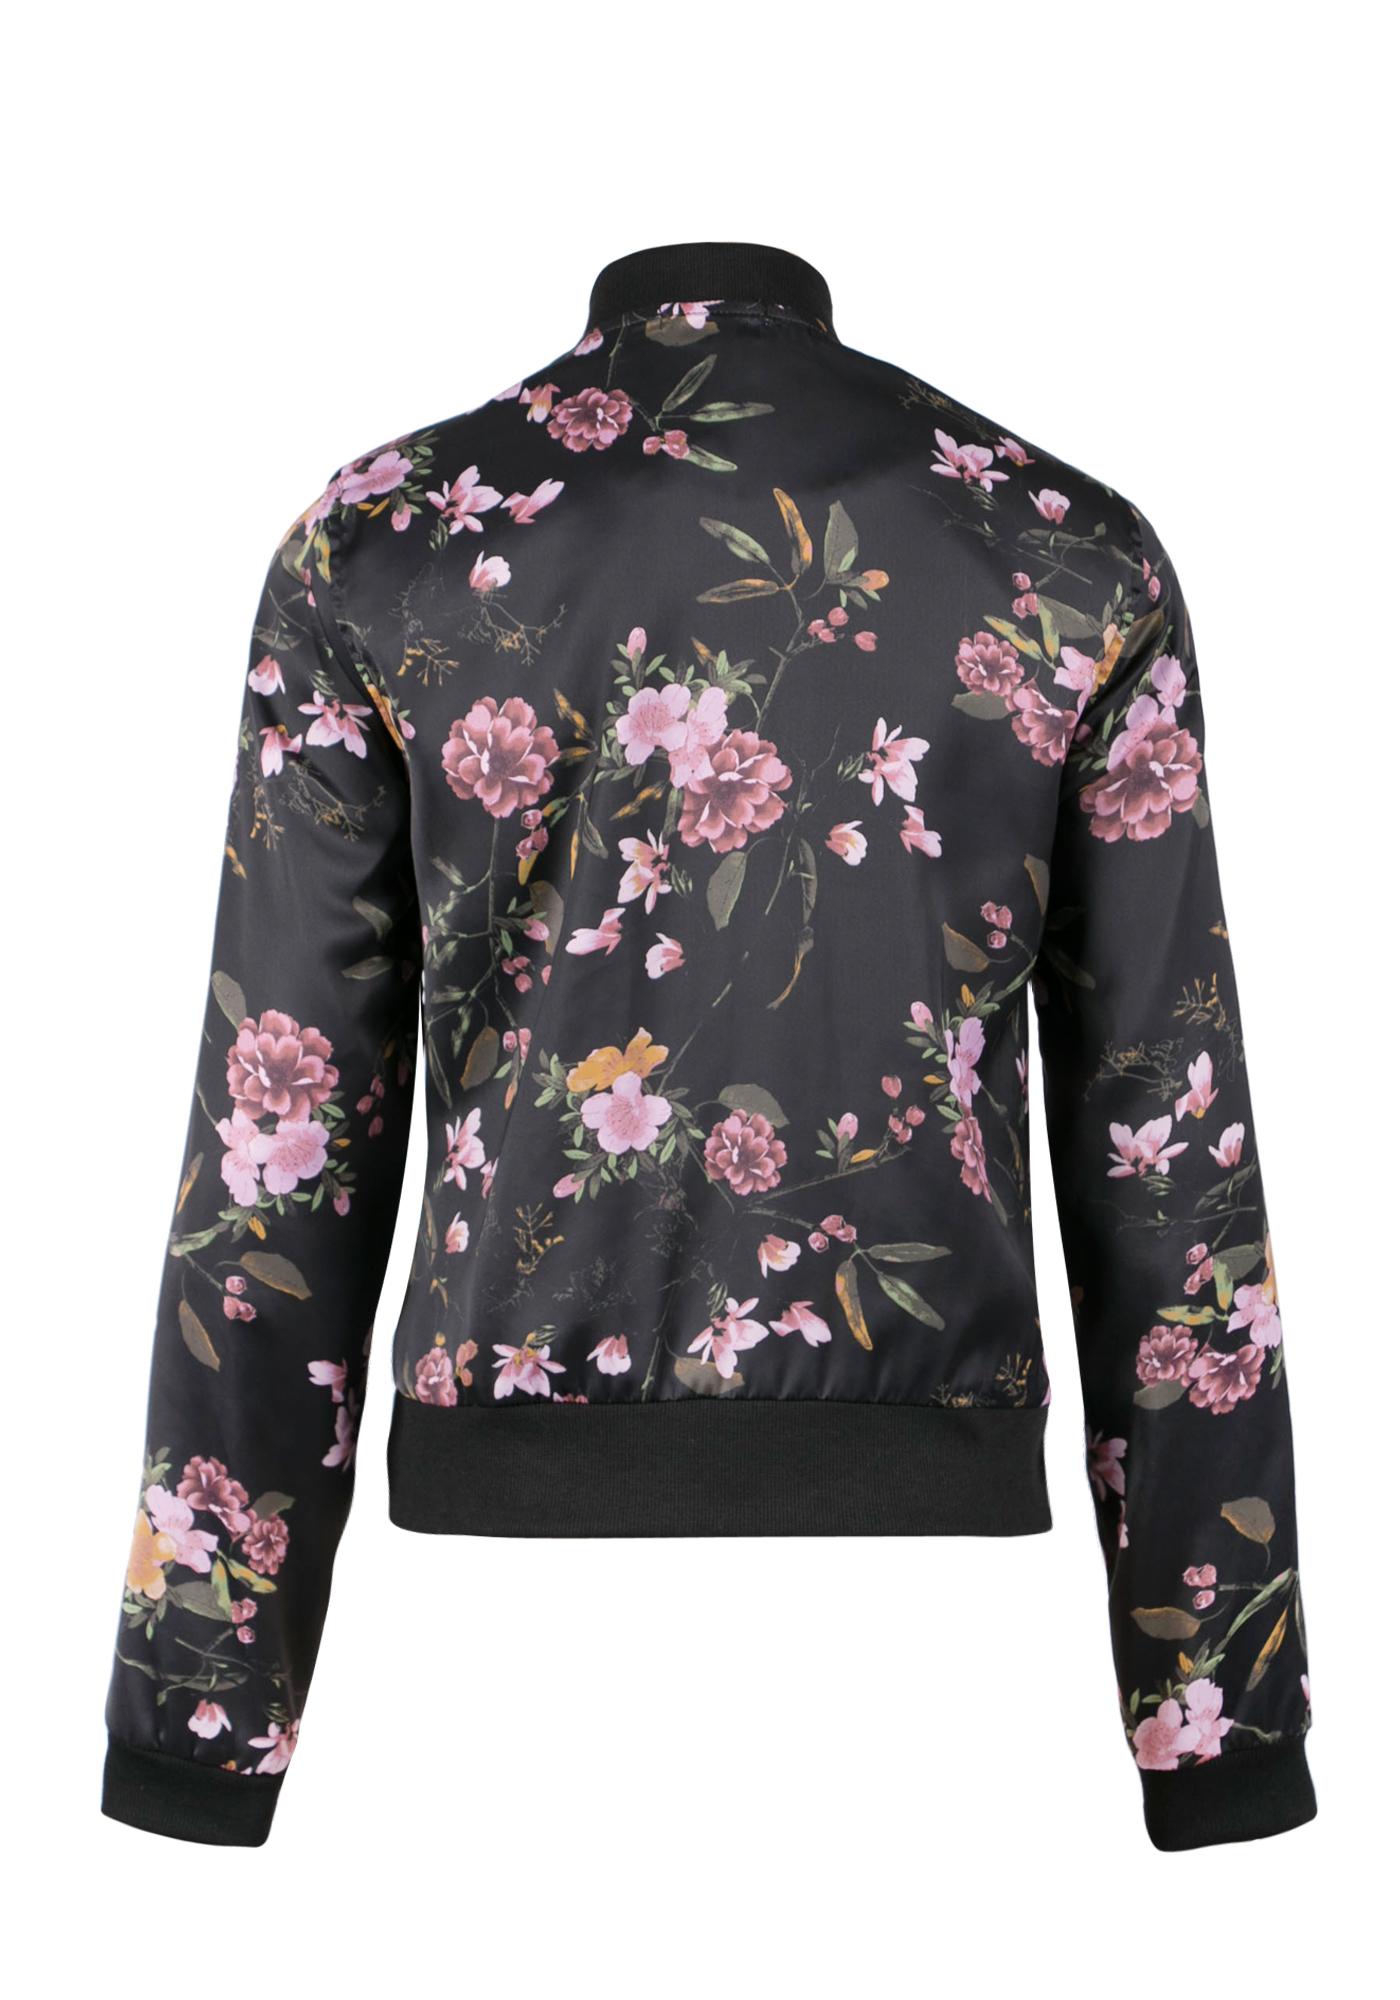 fefb03c6eb6 ... Ladies Floral Bomber Jacket